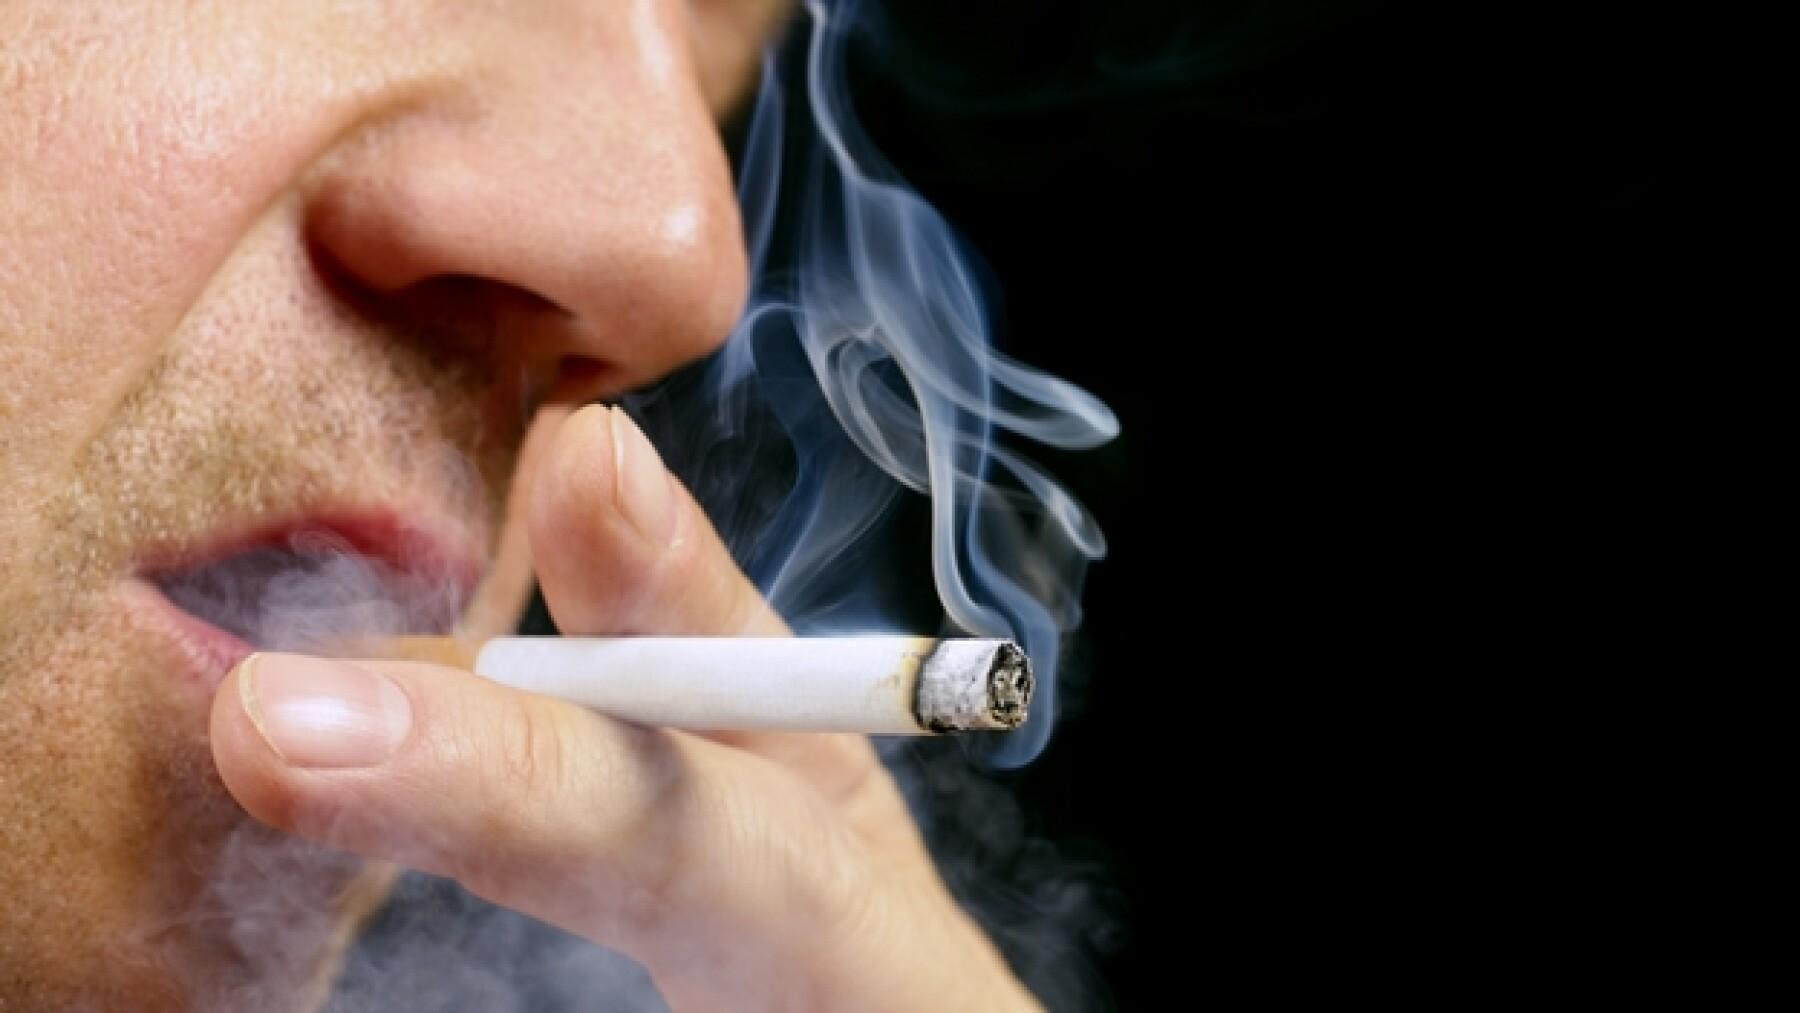 Cigarro, fumar, humo, tabaco, pulmon, cancer